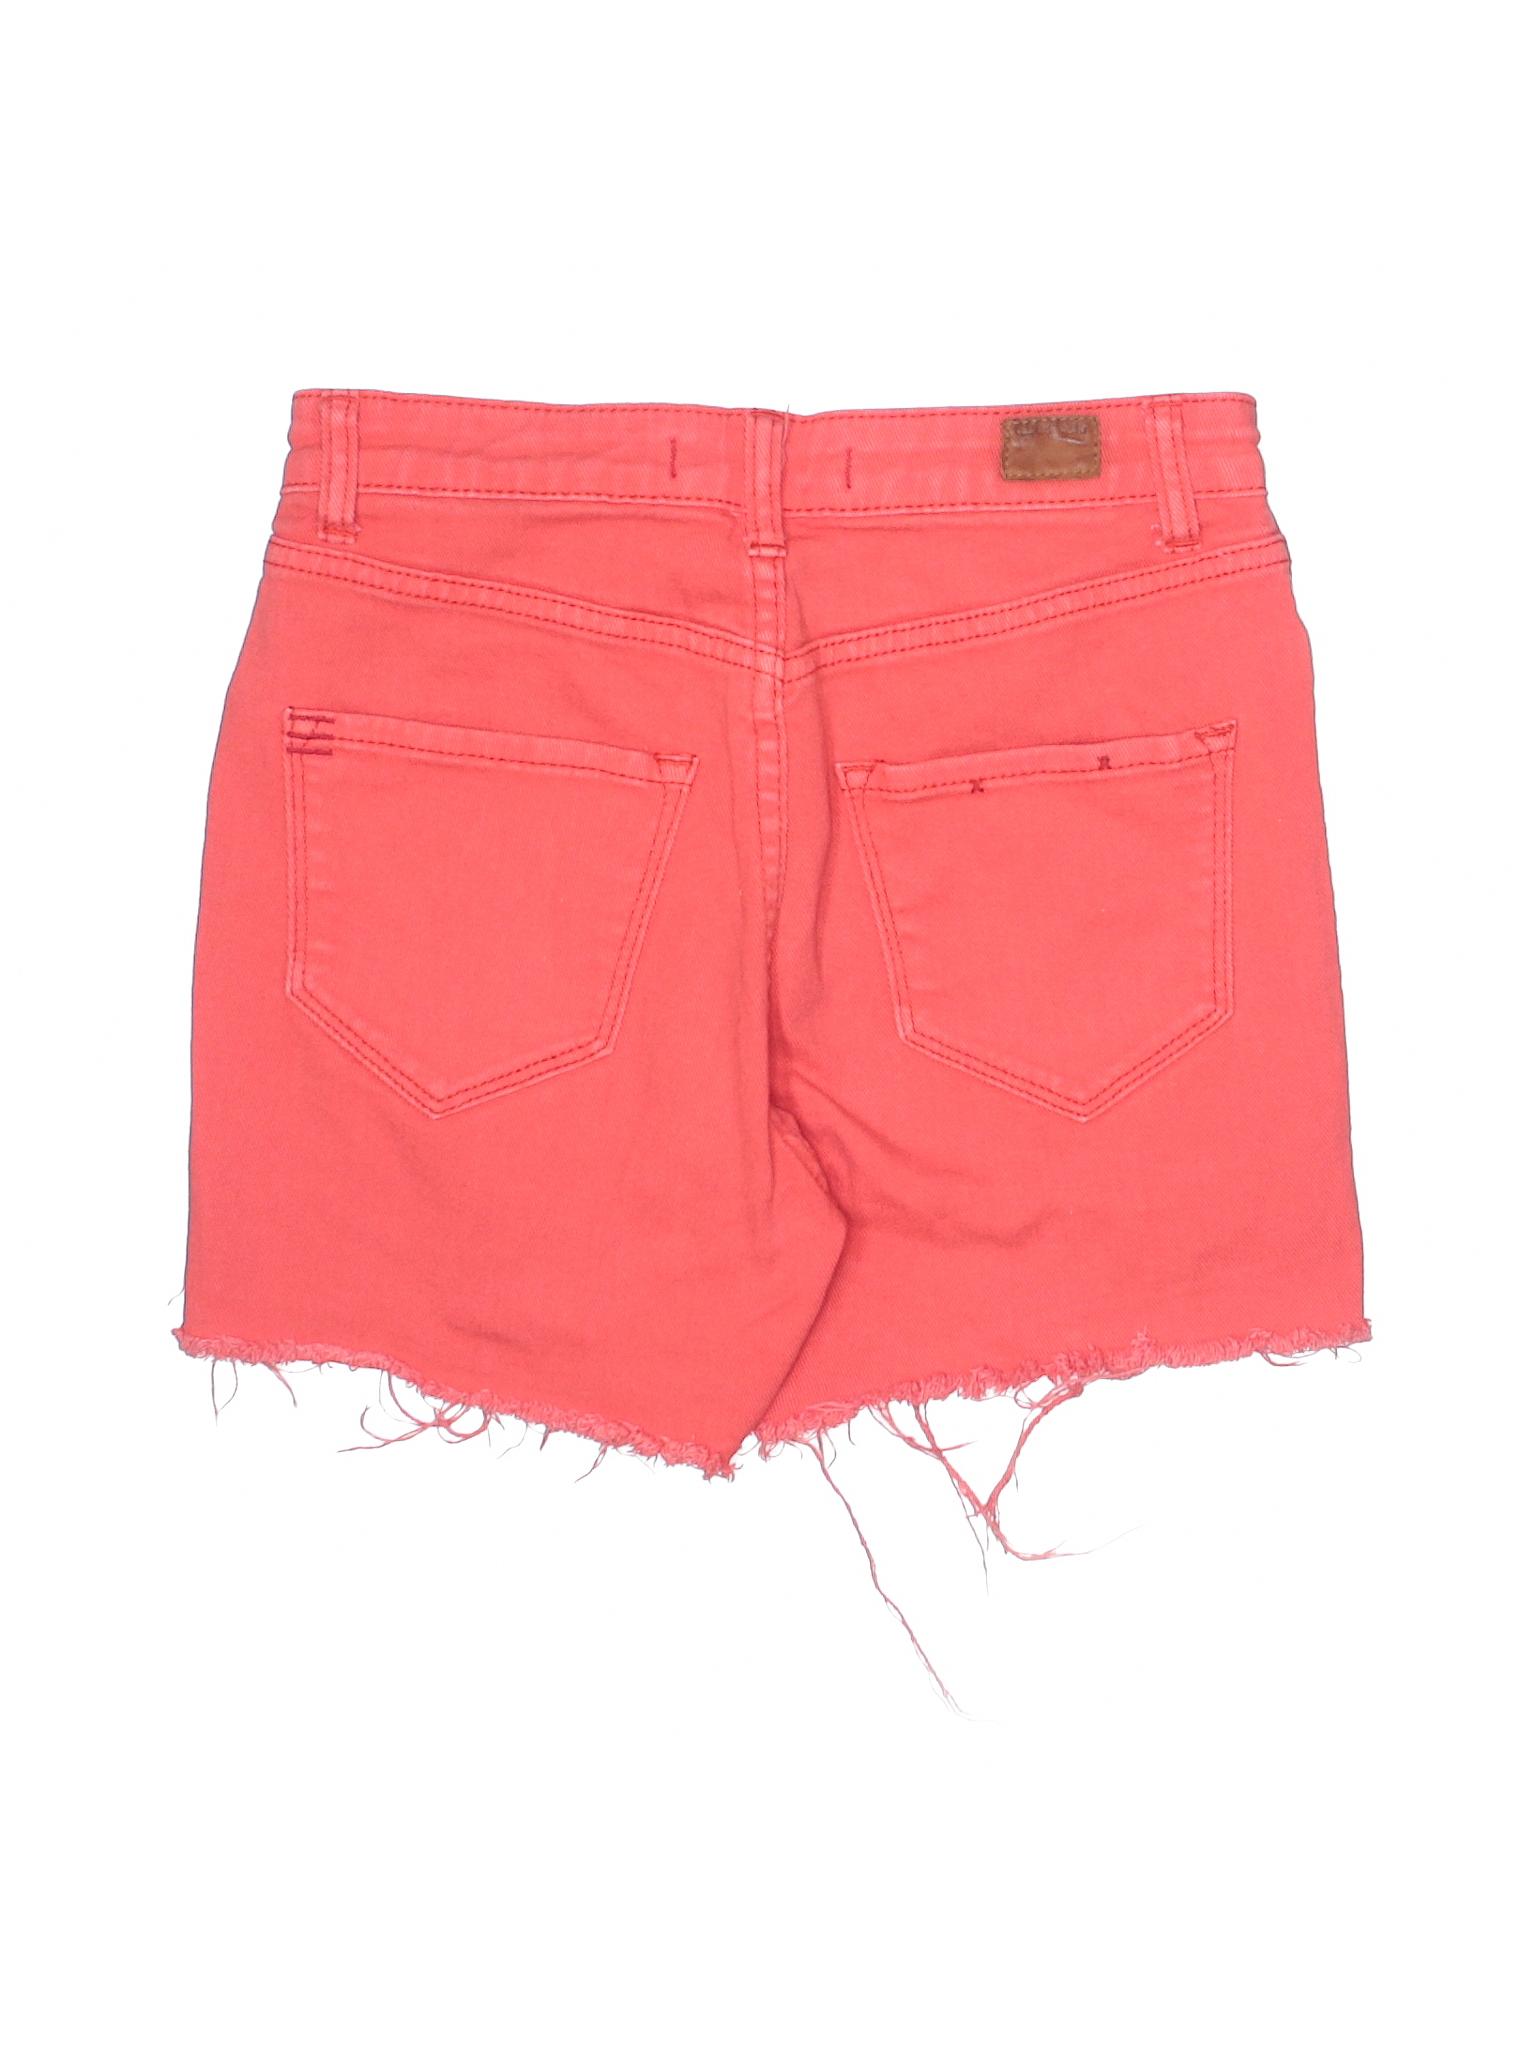 Boutique Boutique Shorts Shorts Denim Boutique BDG Denim Shorts BDG BDG Denim fqTXwwI